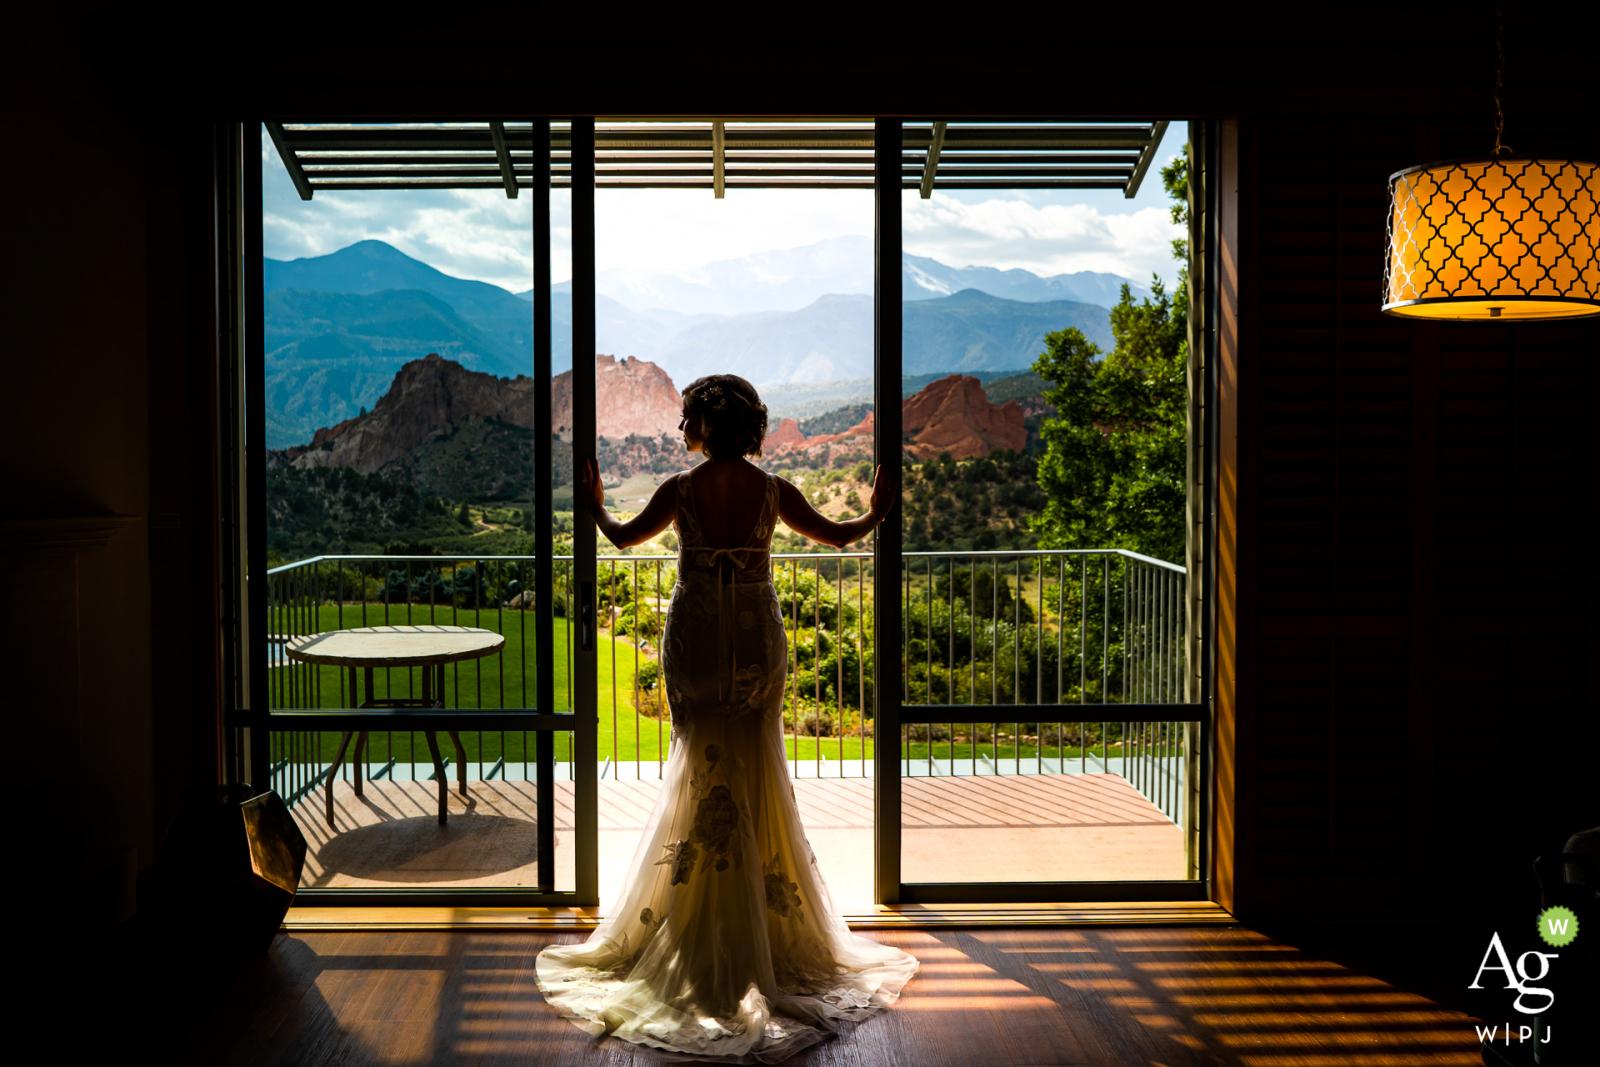 Garden of the Gods Club & Resort, Colorado Springs, Colorado bride posing for wedding images